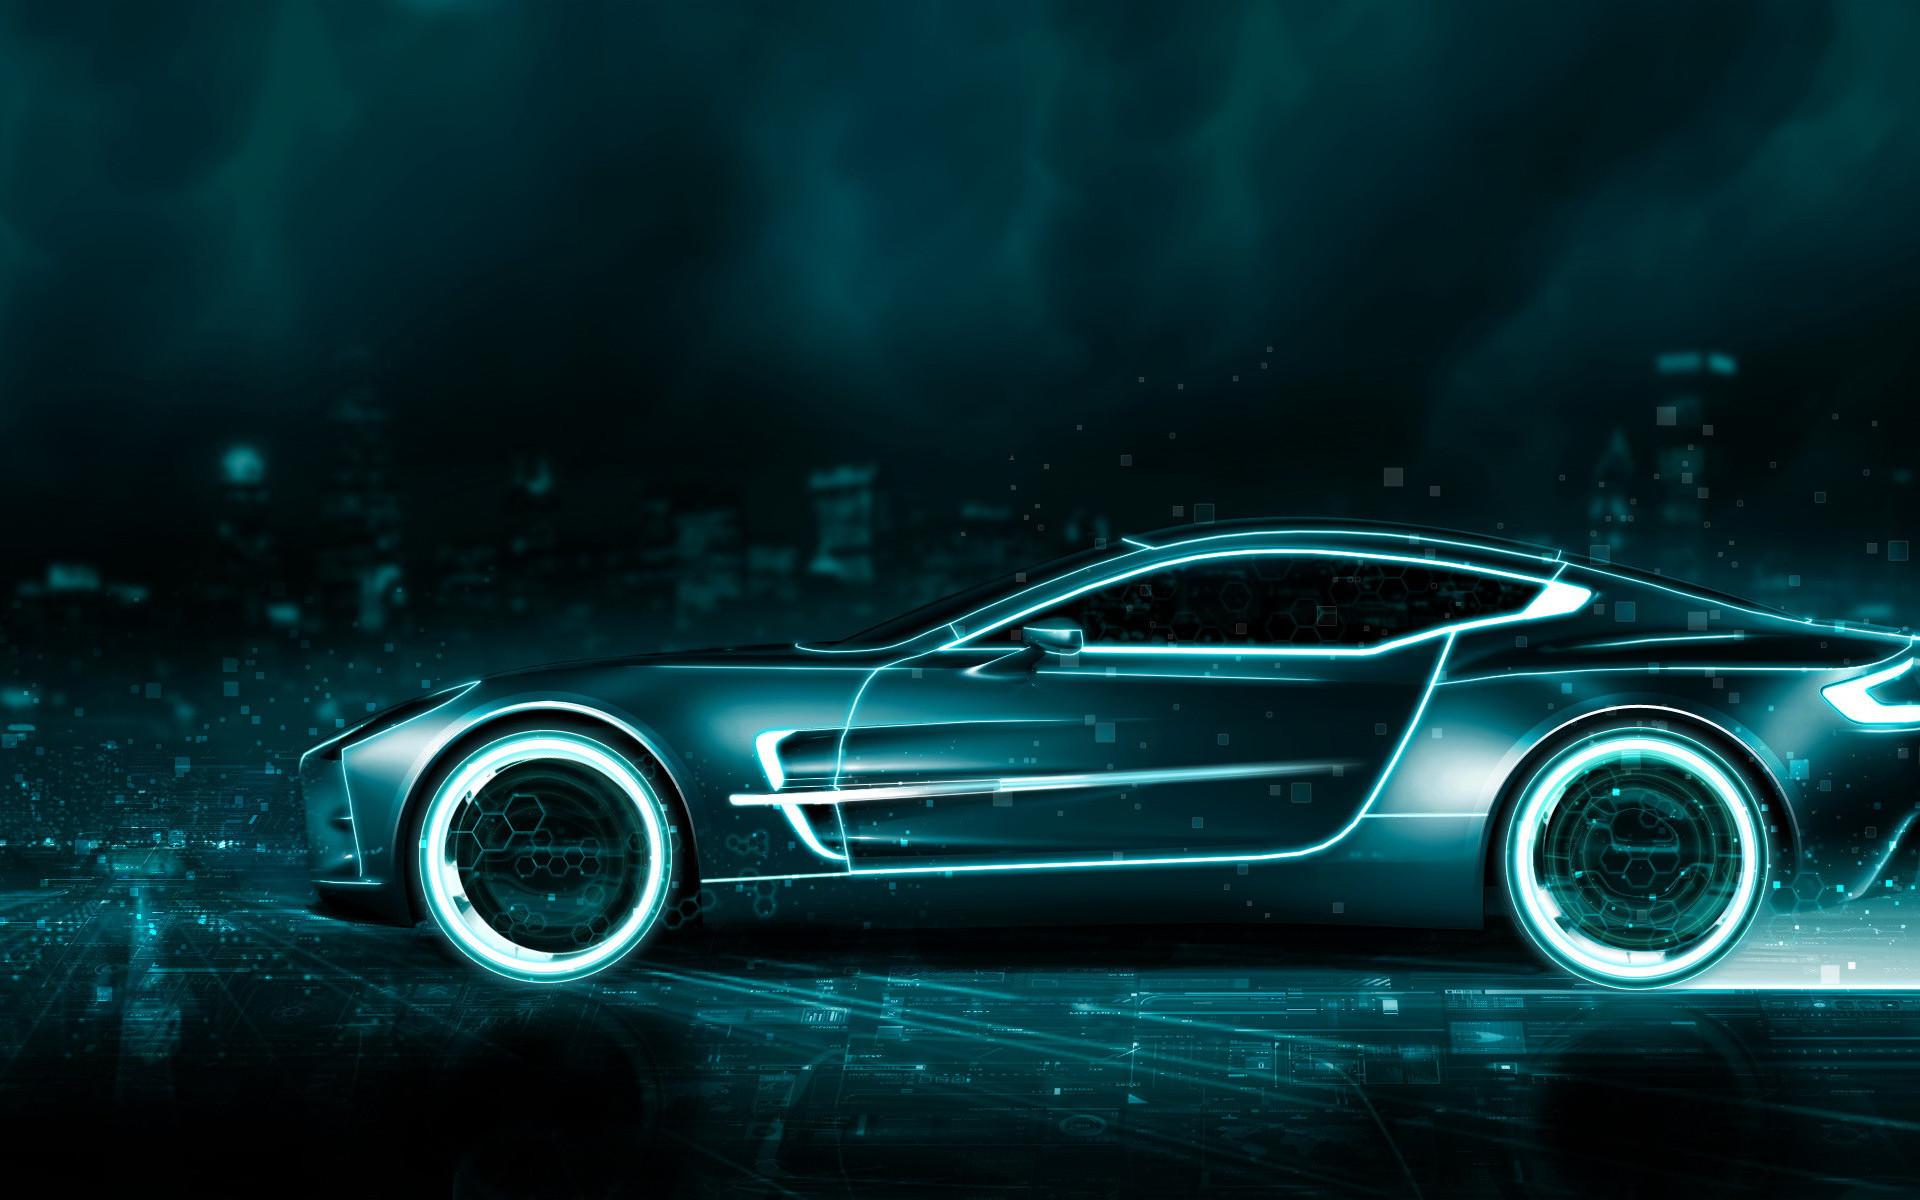 Tron Legacy Aston Martin Vanquish Concept By Rogue Rattlesnake On Deviantart